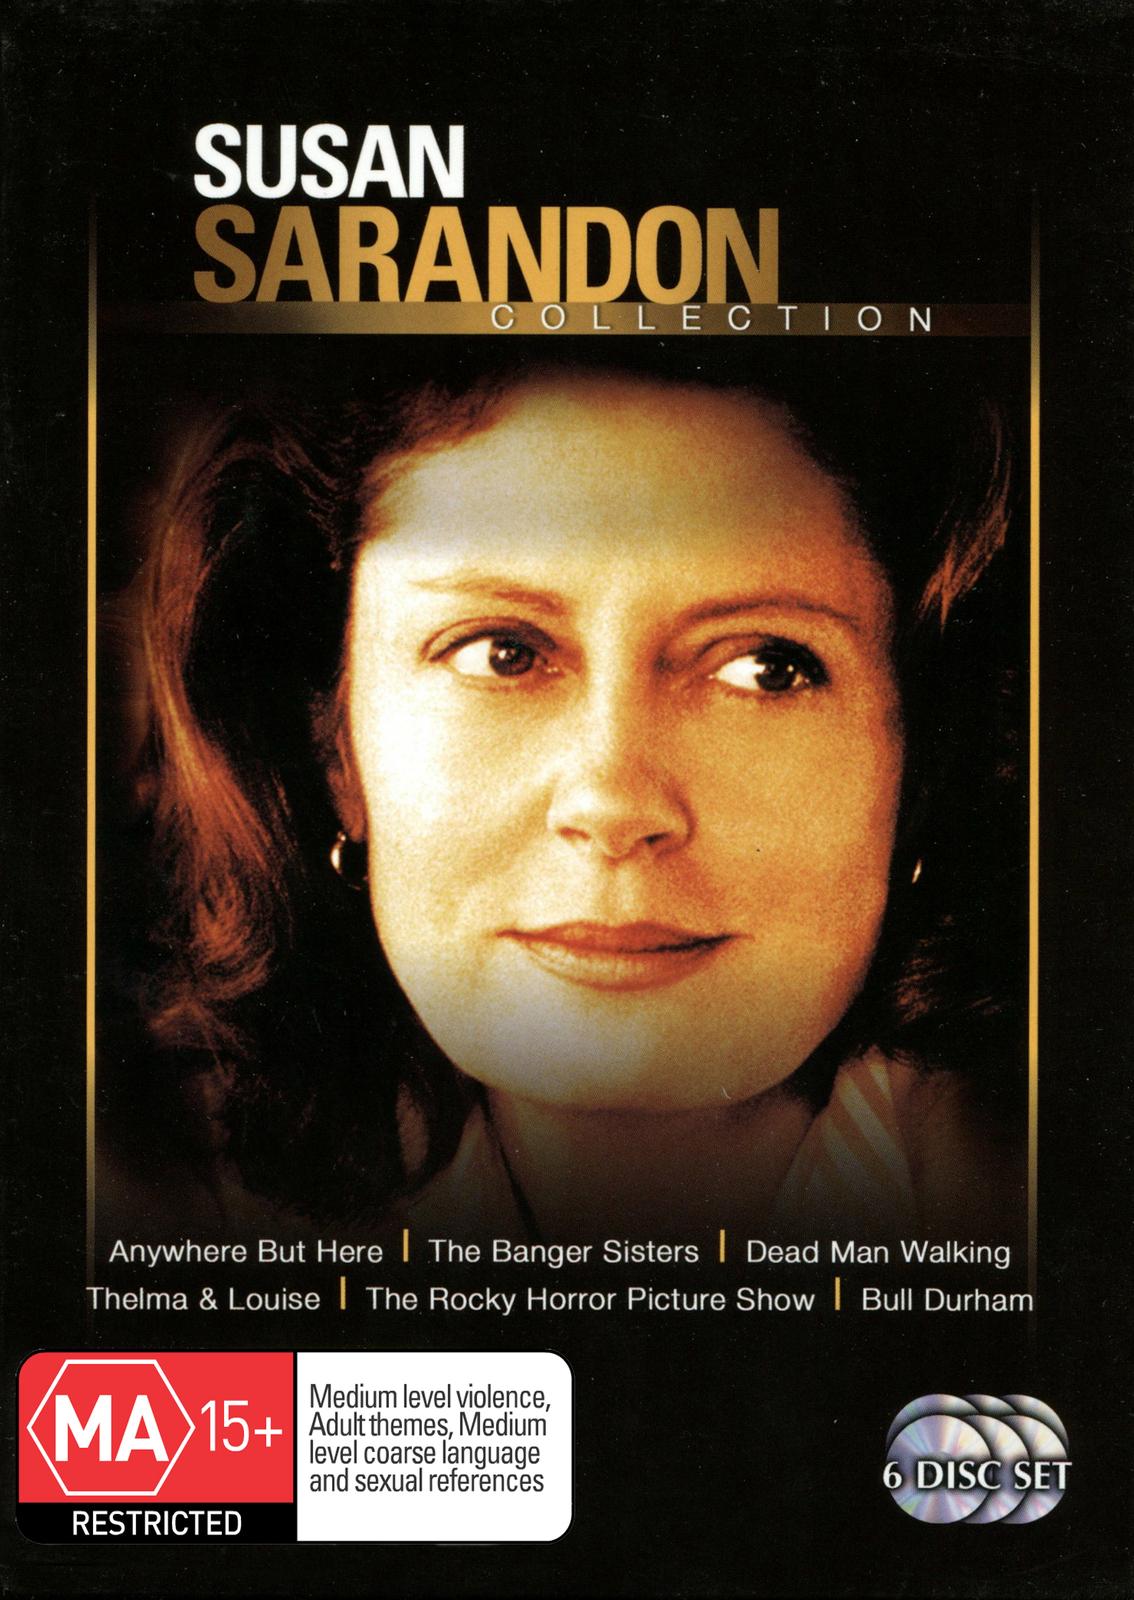 Susan Sarandon Collection (6 Disc Set) on DVD image